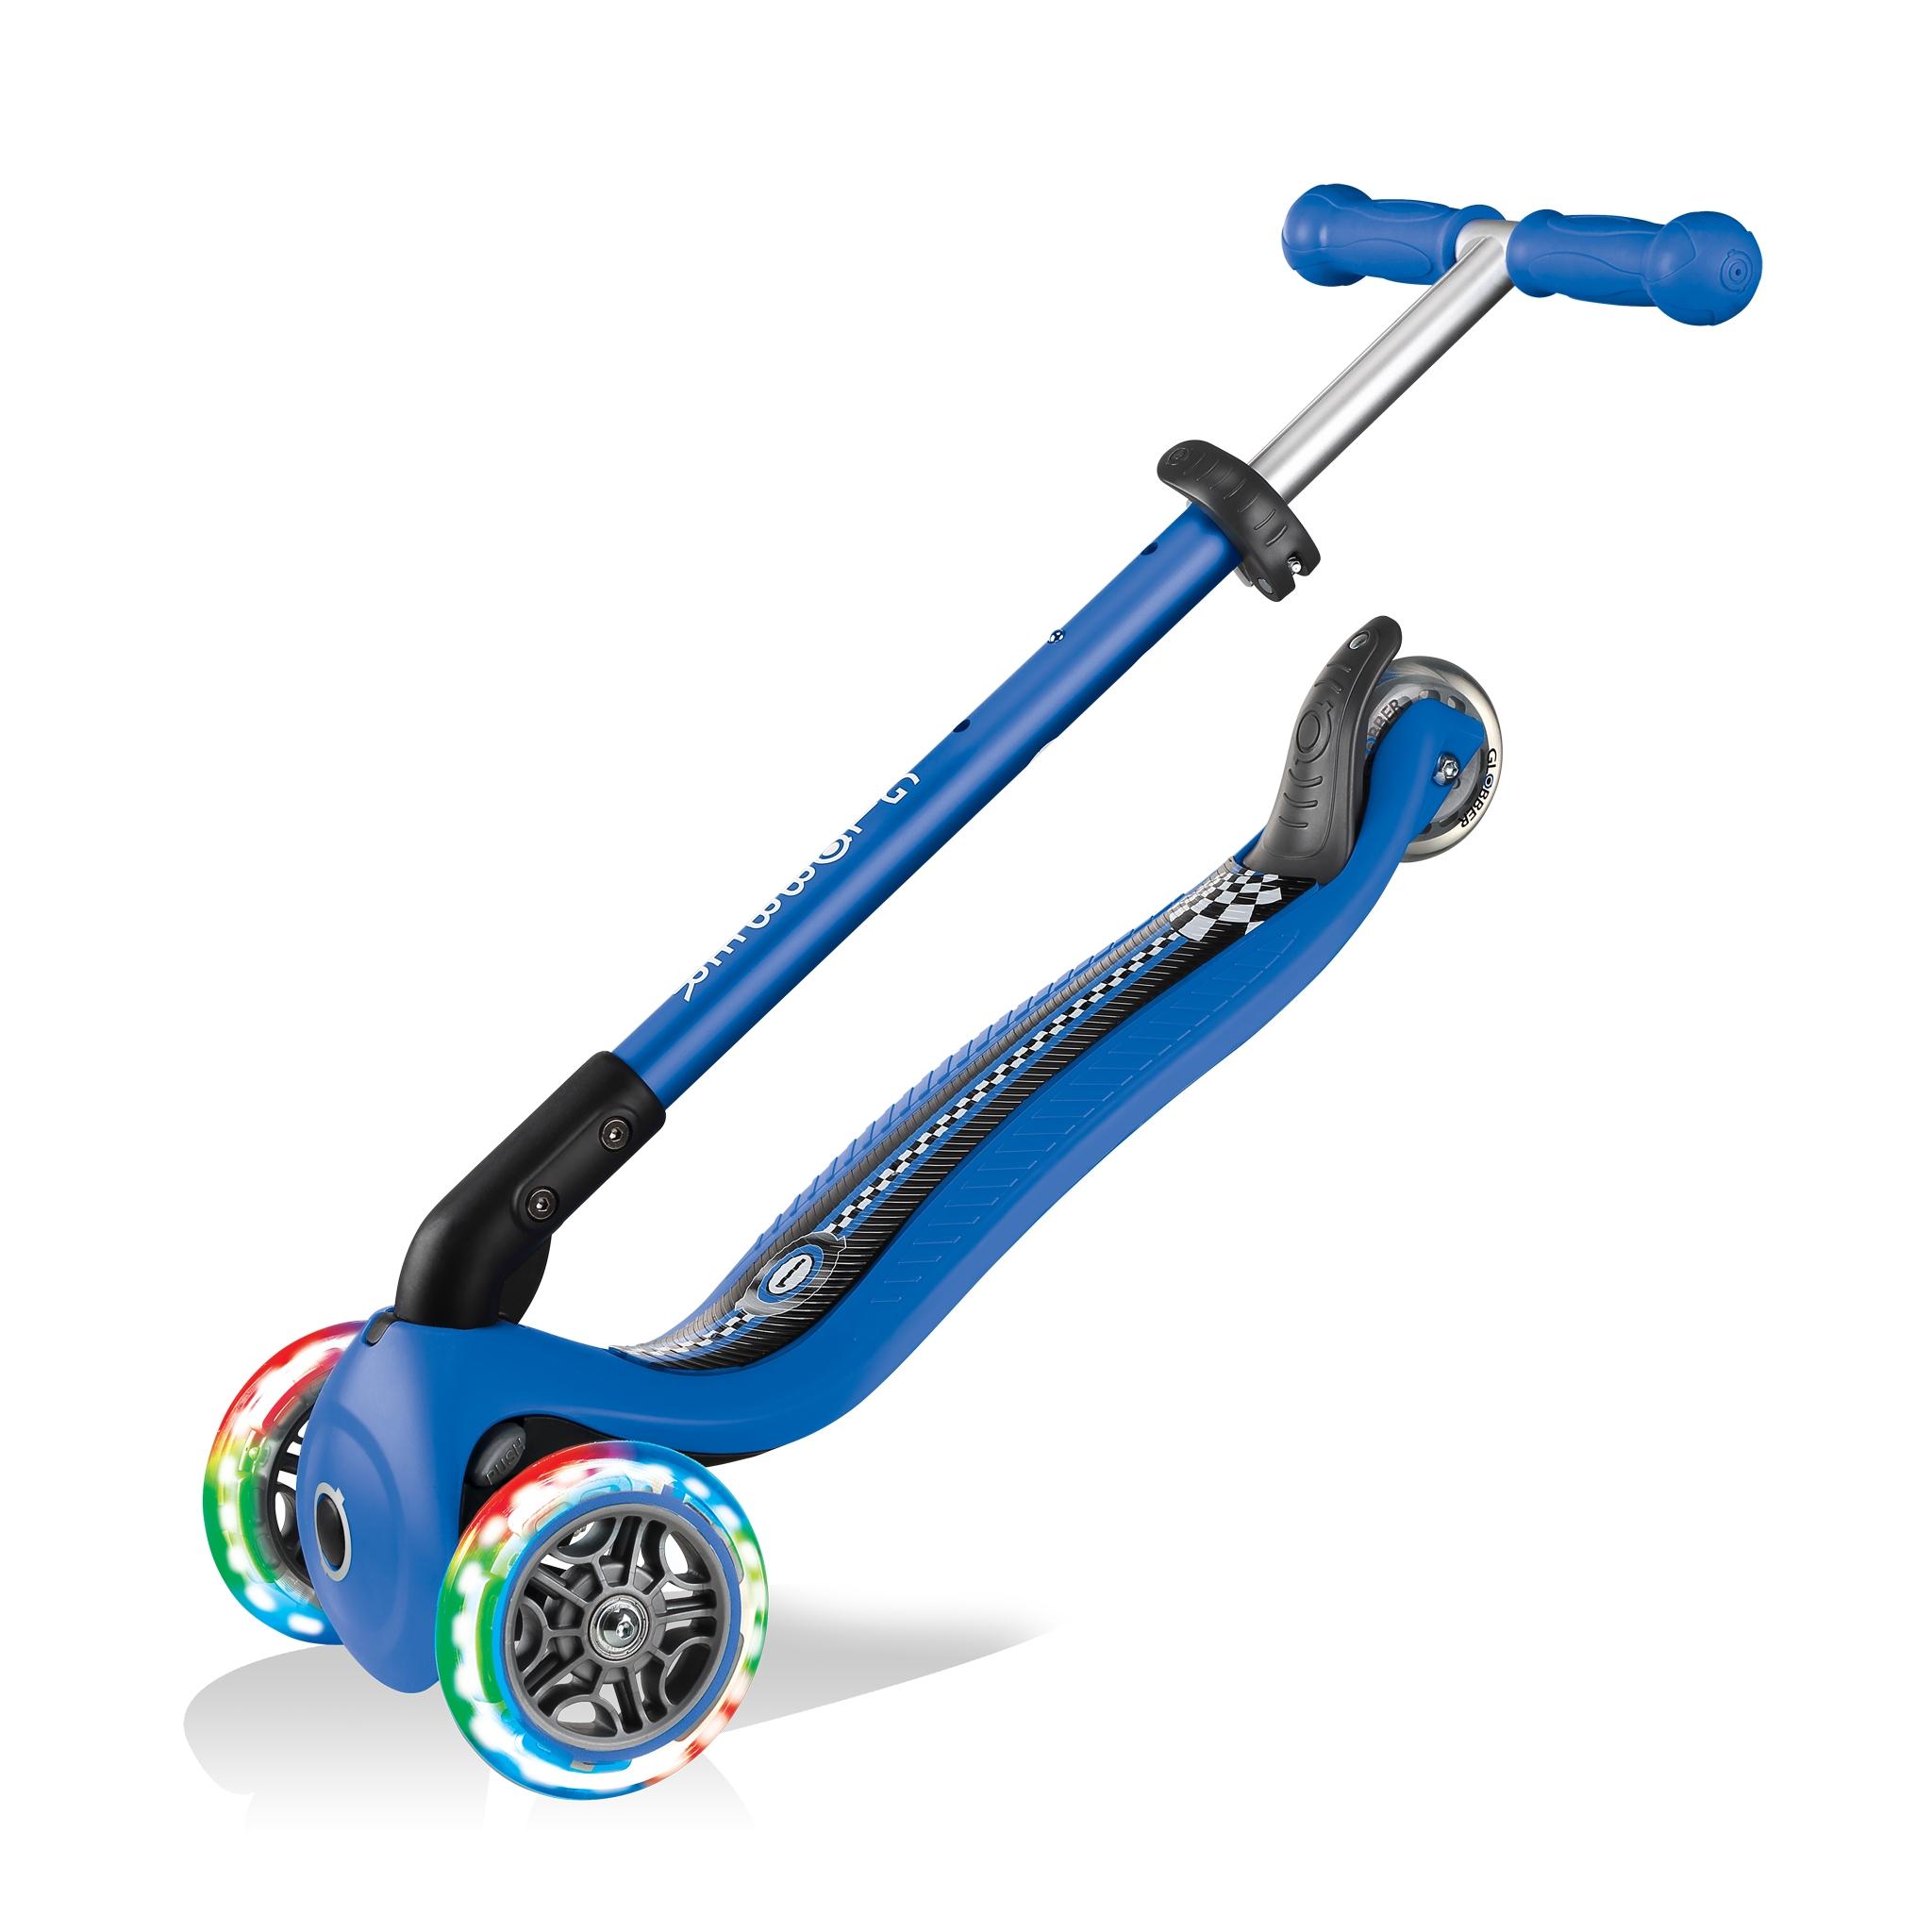 primo-foldable-fantasy-lights-light-up-scooter-for-kids-trolley-mode